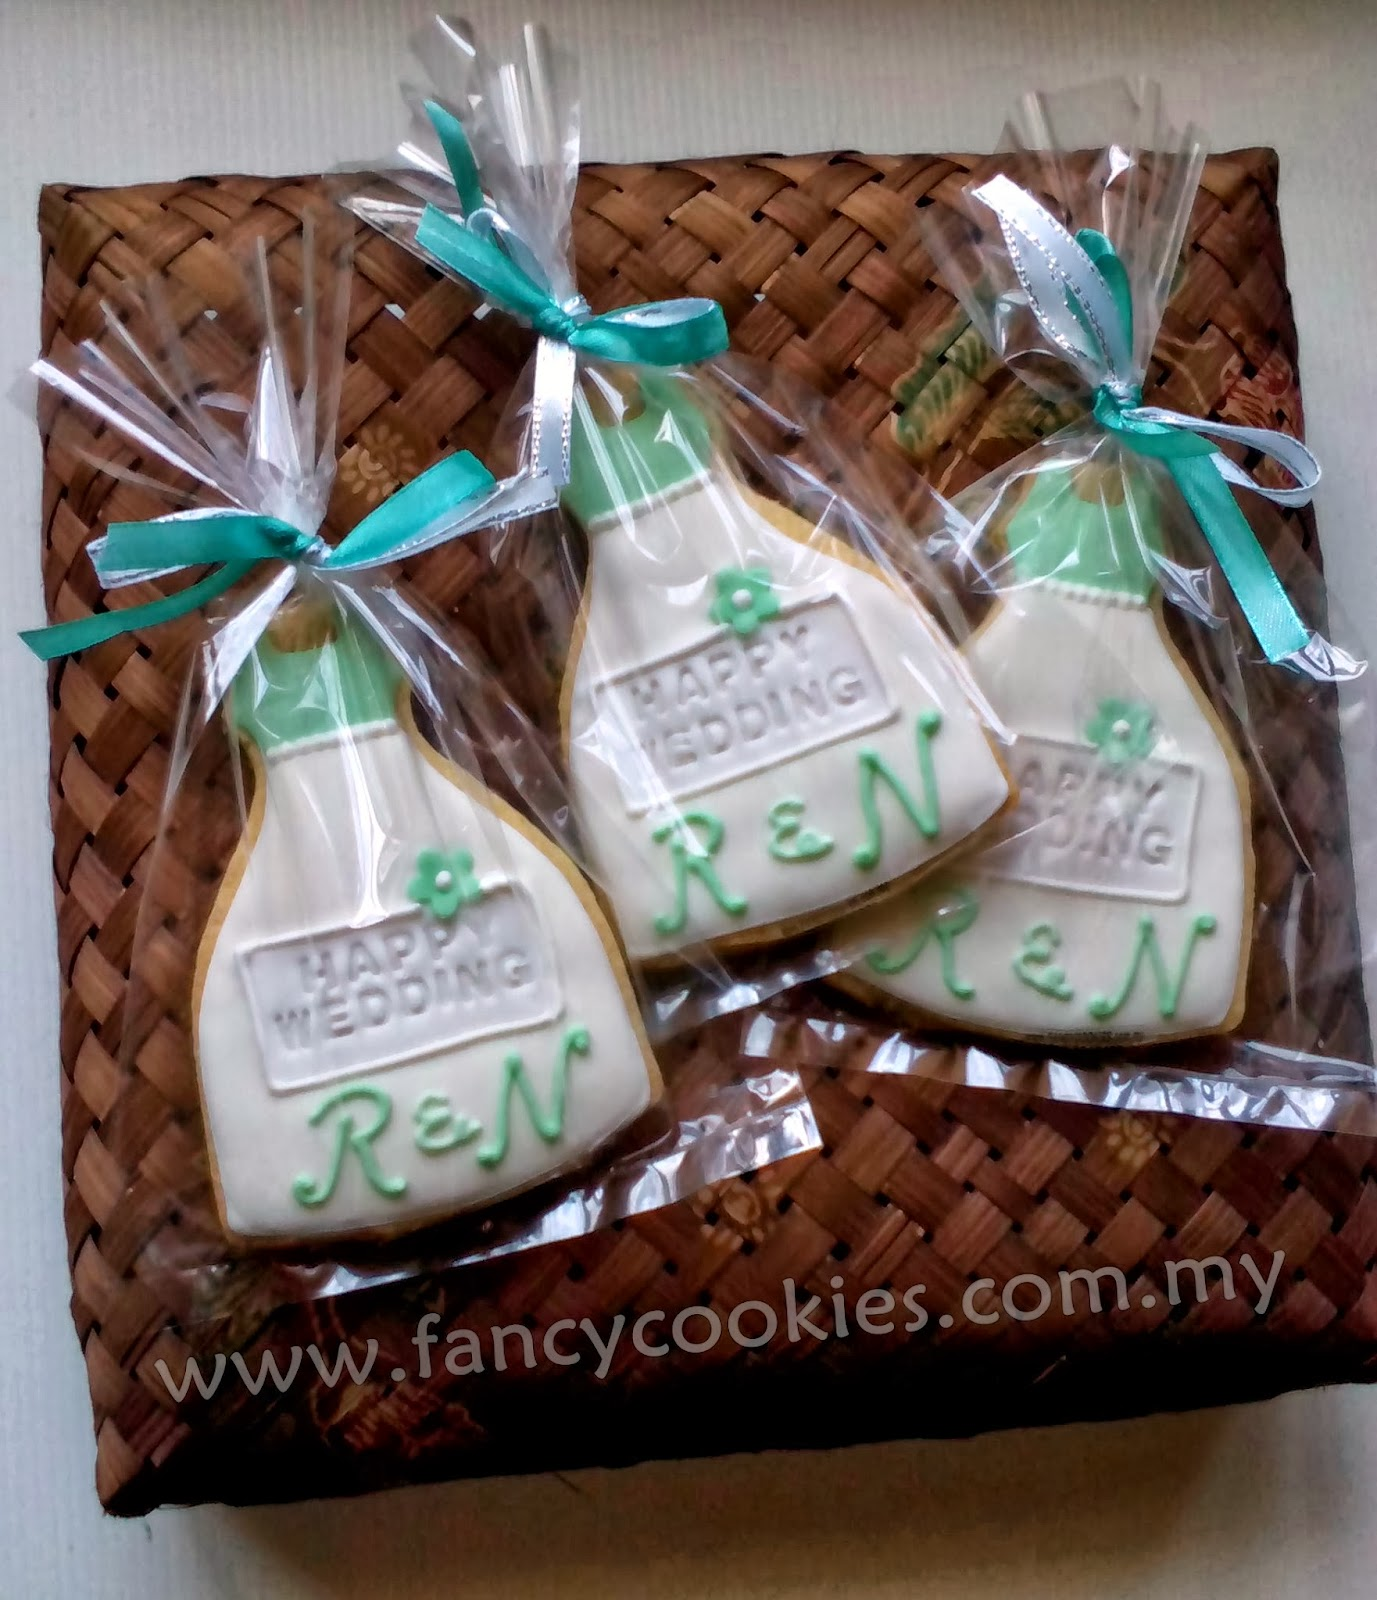 Cookies For Wedding Door Gift : fancy cookies and chocolate for your occassion: Fancy Cookies Wedding ...